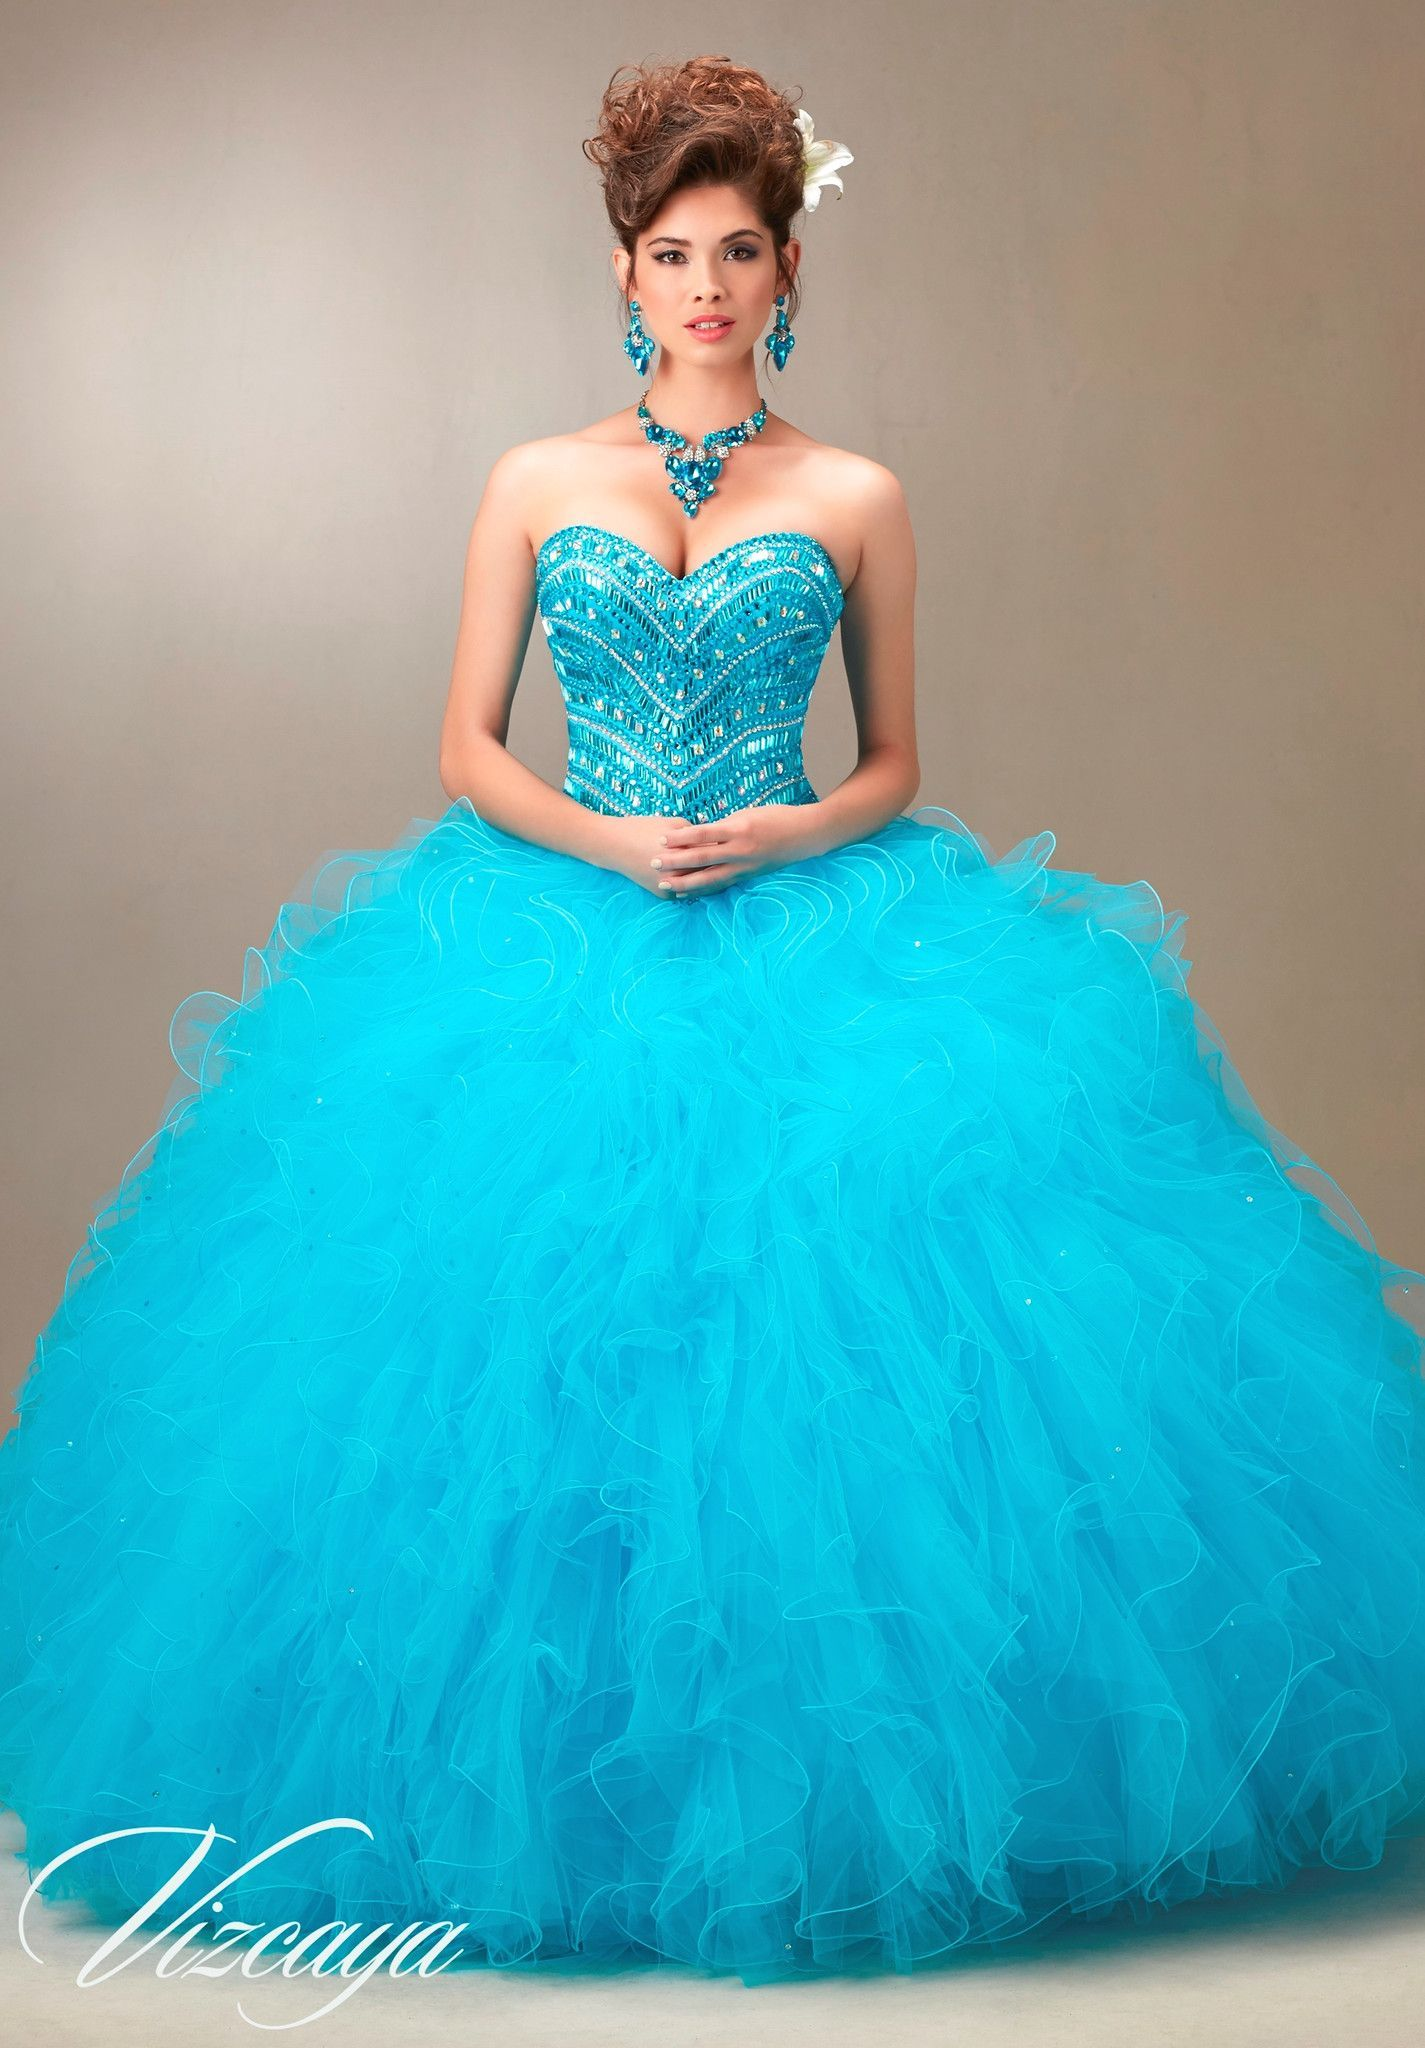 Mori lee quinceanera dress style beauty dresses pinterest